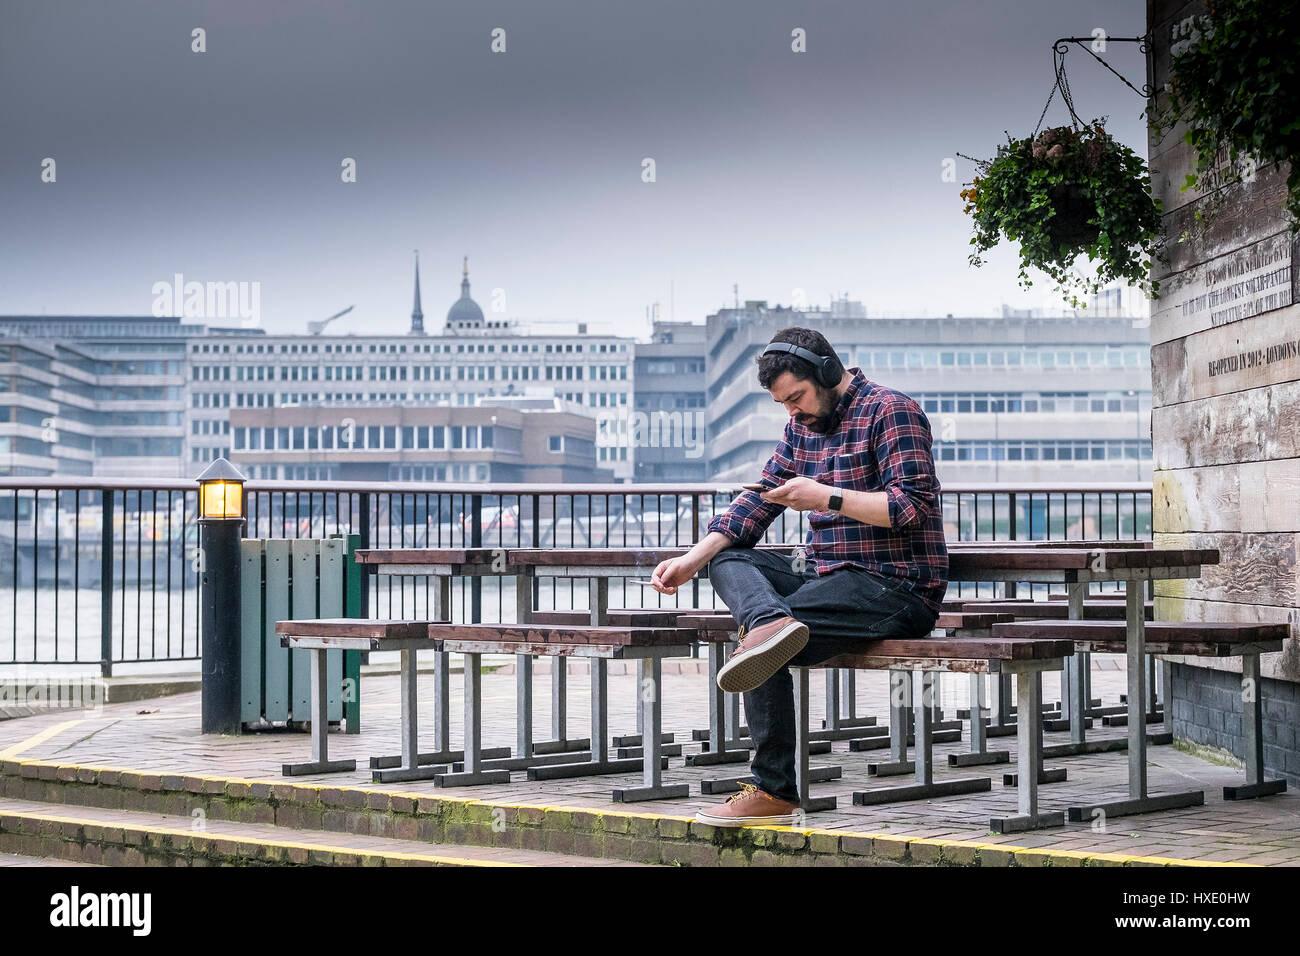 Man Leisure Sitting Smoking Earphones Relaxing Relaxation London - Stock Image